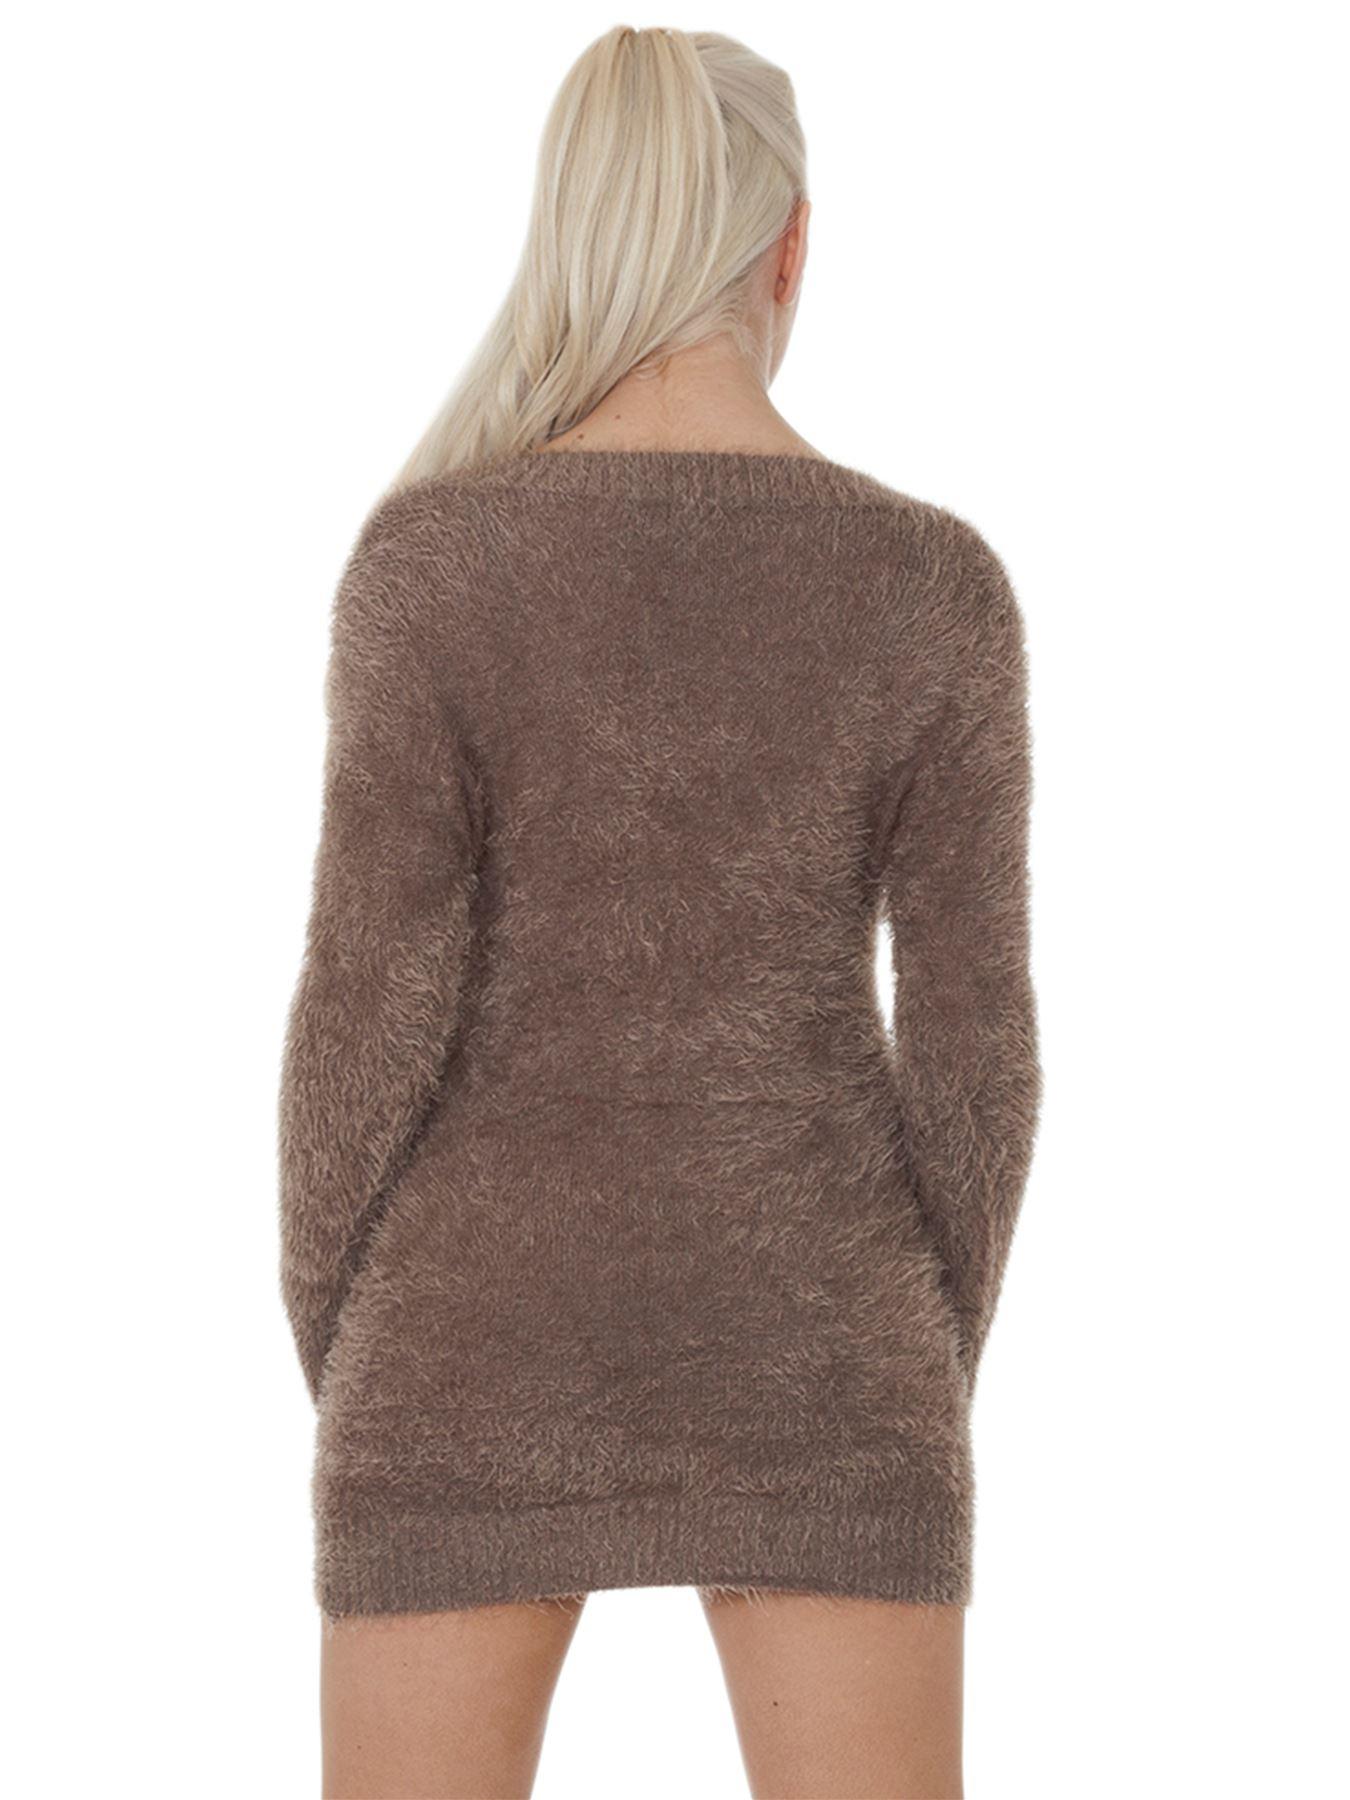 Pull-Femme-Femmes-Tricote-Cardigans-Plain-Tricot-Moelleux-Col-V-Manches-Longues miniature 22